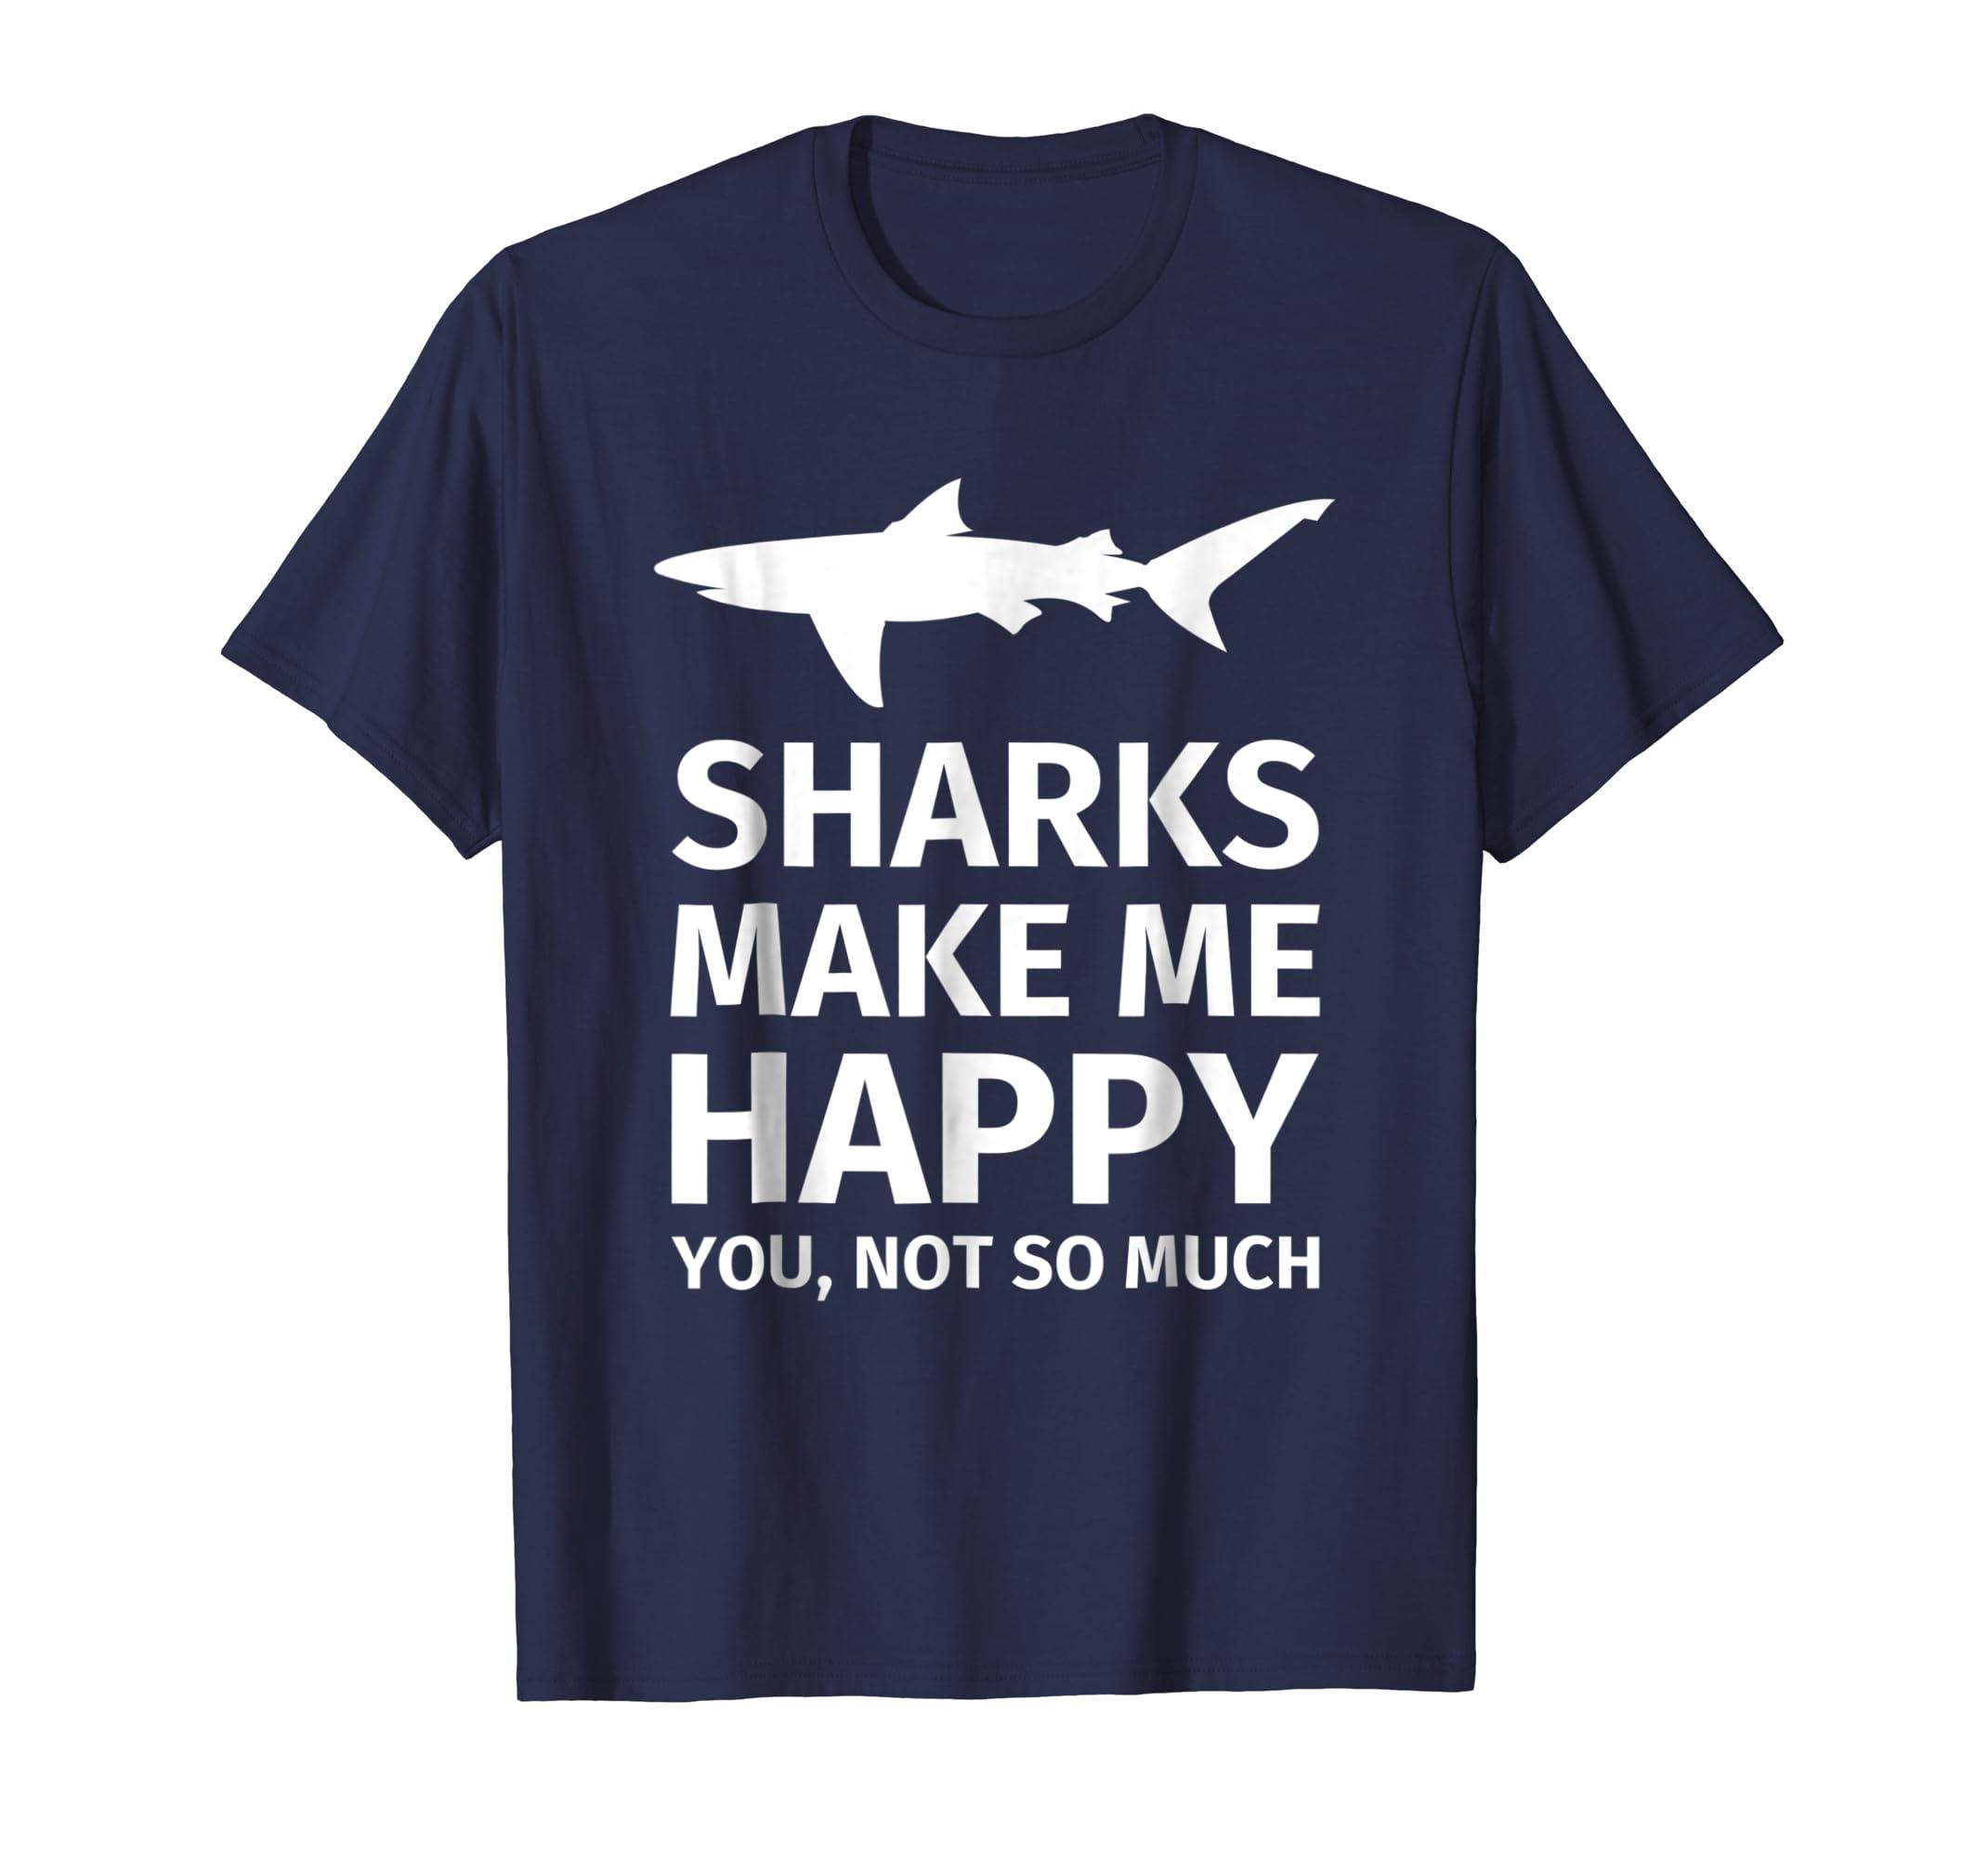 Shark Gifts for Shark Lovers   Funny Sharks Happy T Shirt-Teehay